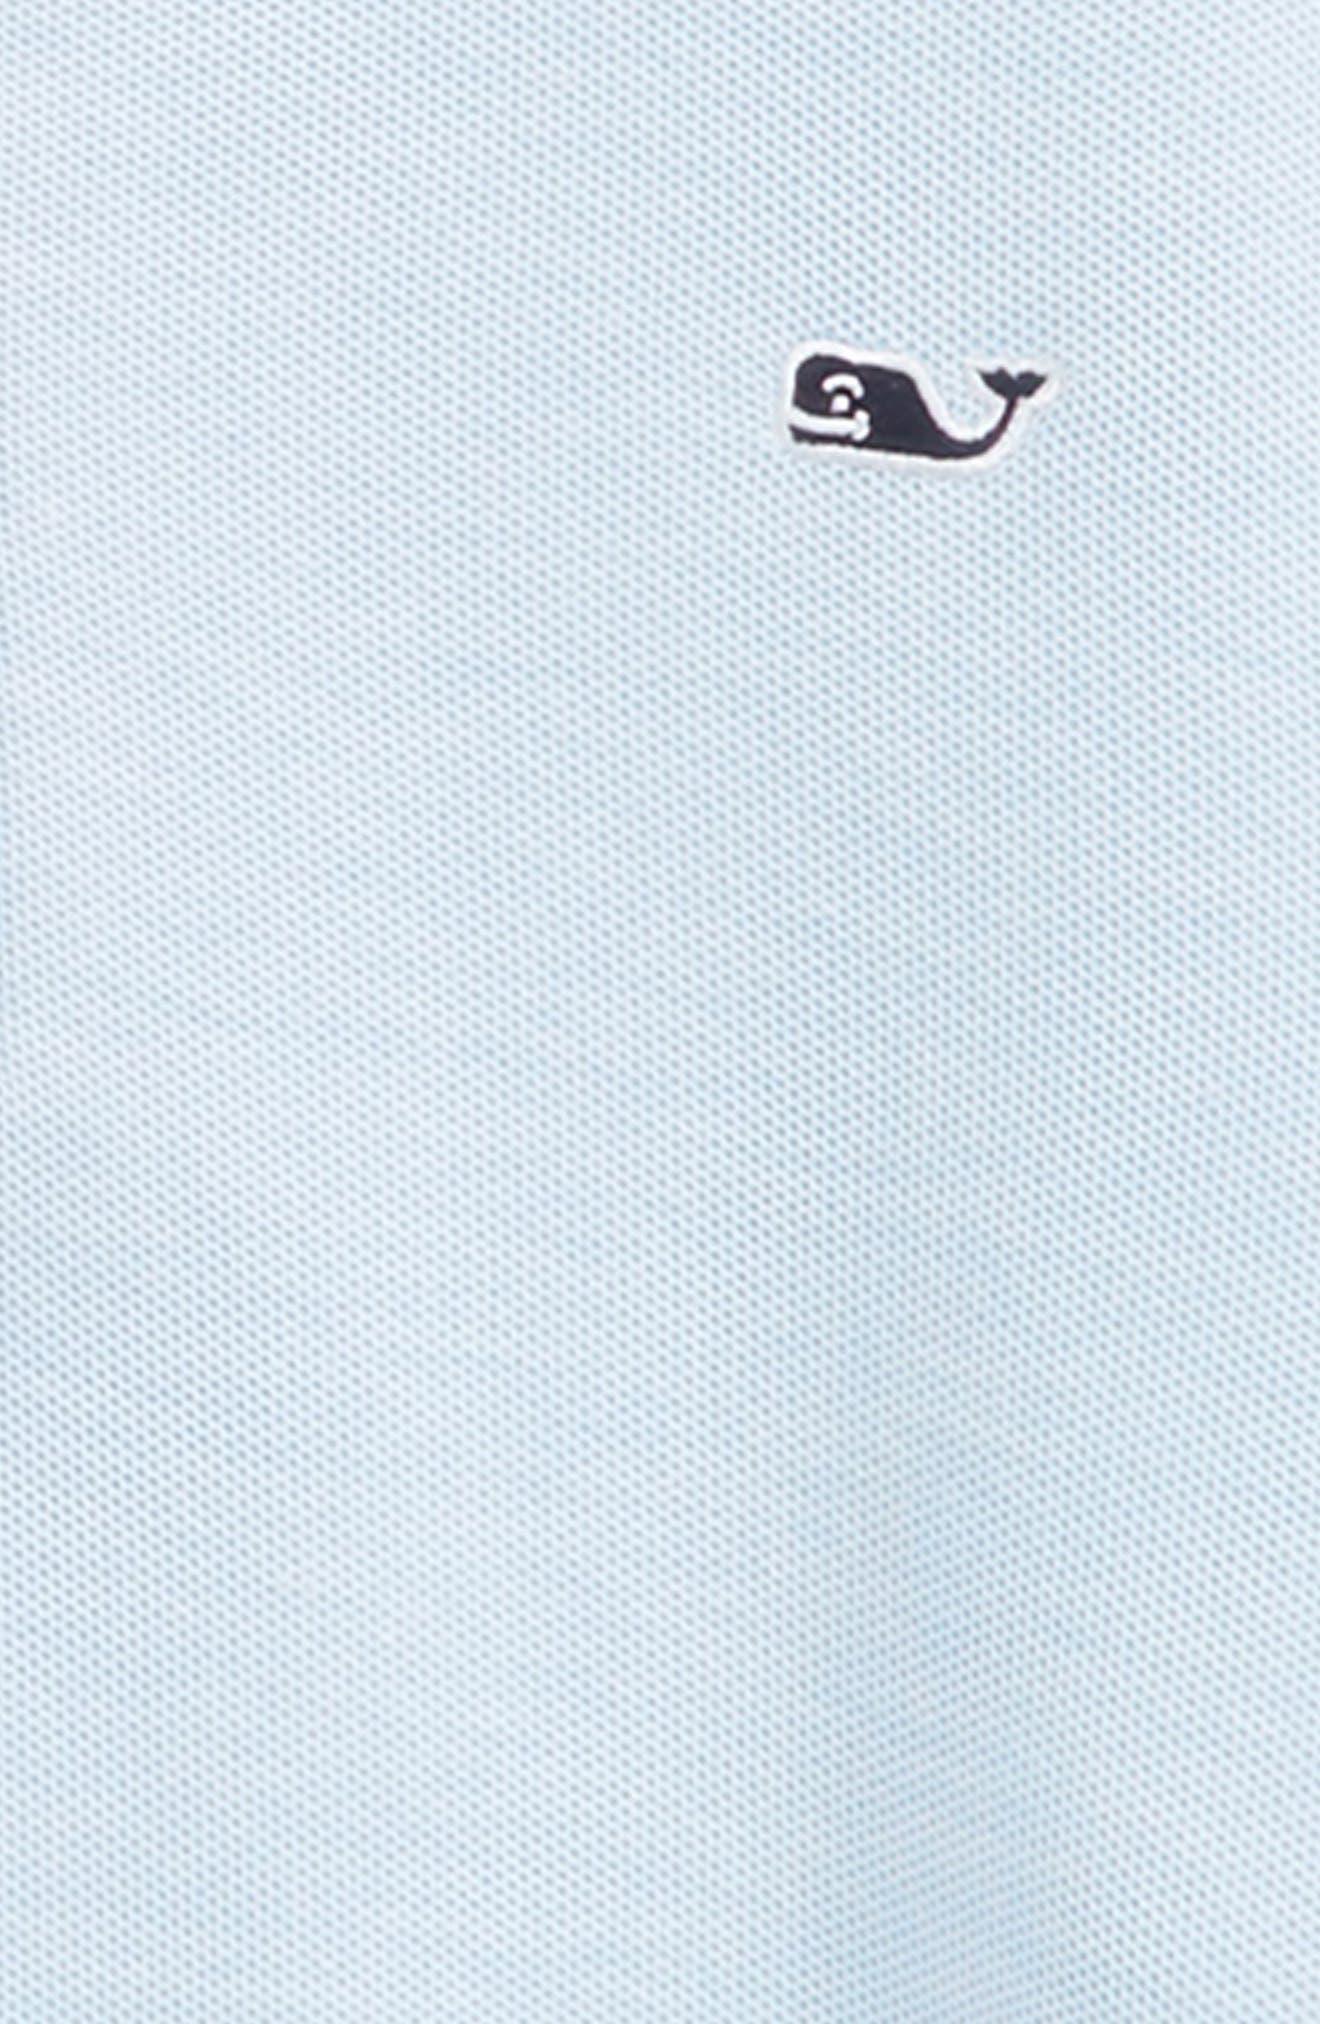 Quarter Zip Sweater,                             Alternate thumbnail 2, color,                             Ocean Breeze